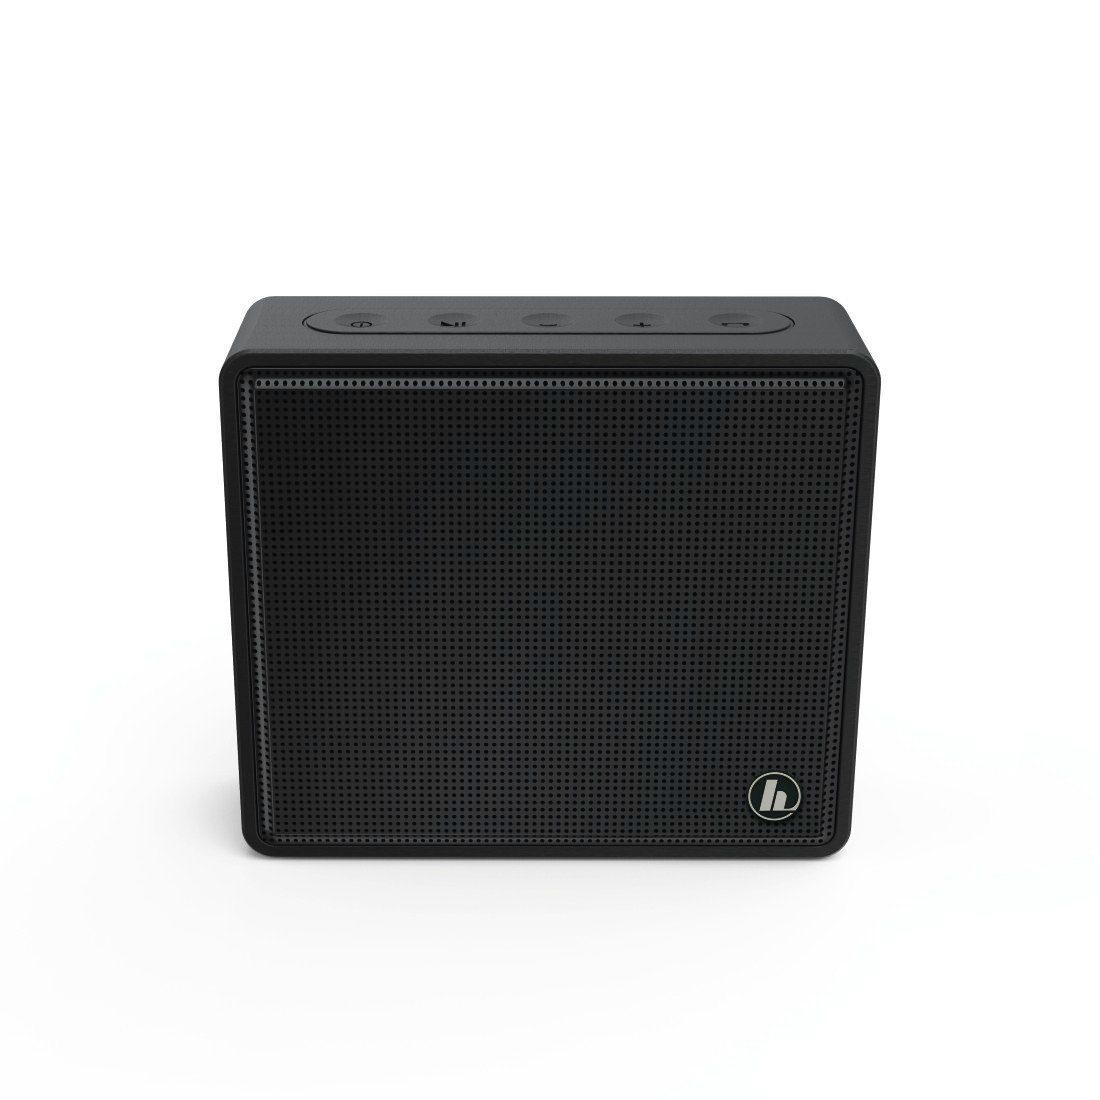 Hama Mobiler Bluetooth-Lautsprecher Pocket, Schwarz